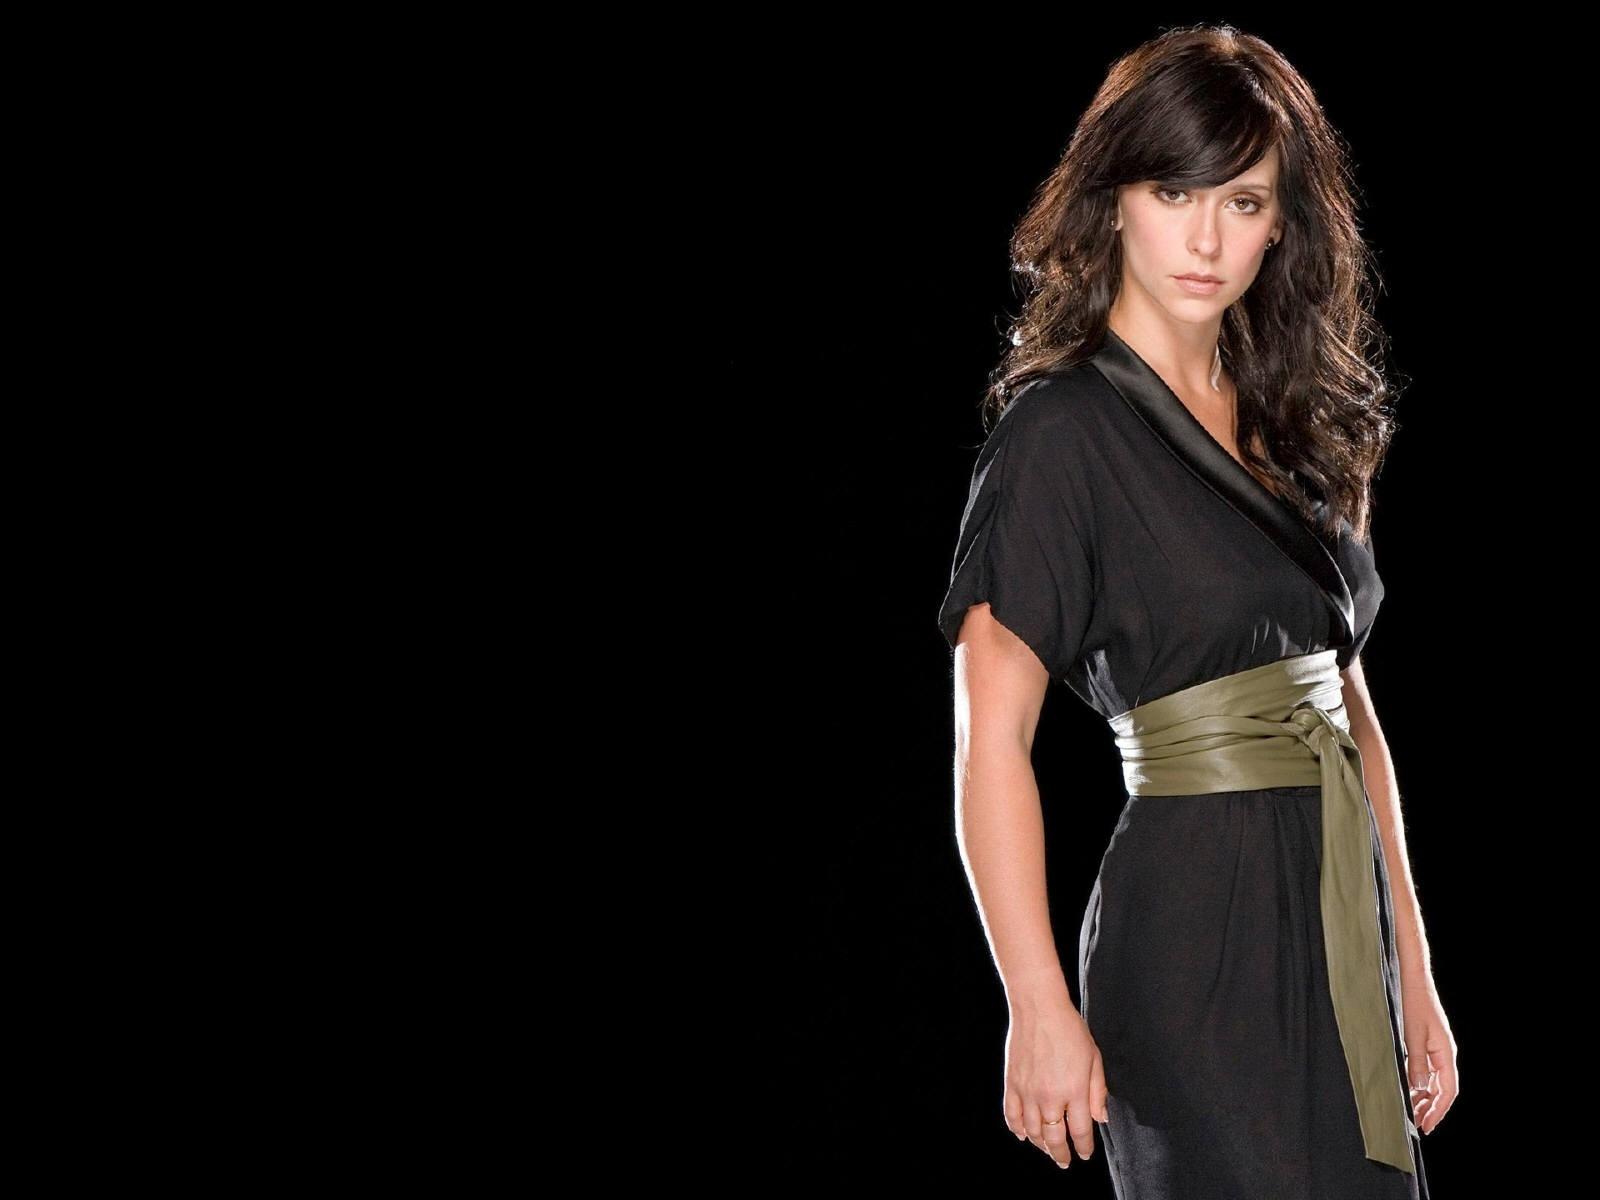 Wallpaper di Jennifer Love Hewitt fasciata in un abito nero